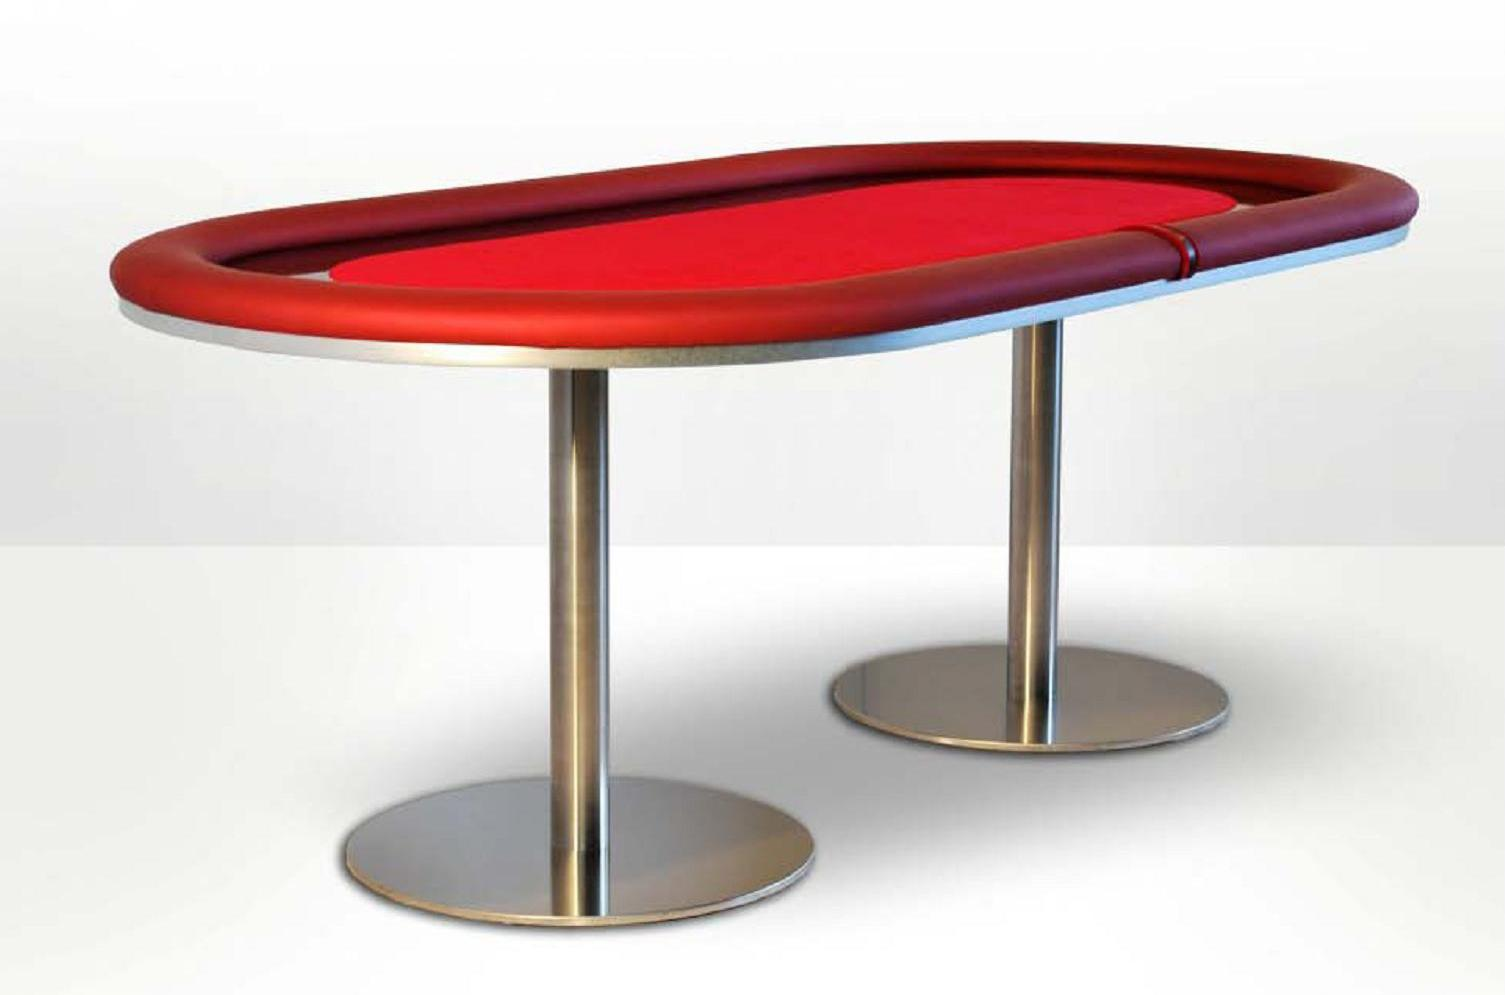 Mesa de poker oval caiman dise o metal vermelho for Mesas plegables de diseno